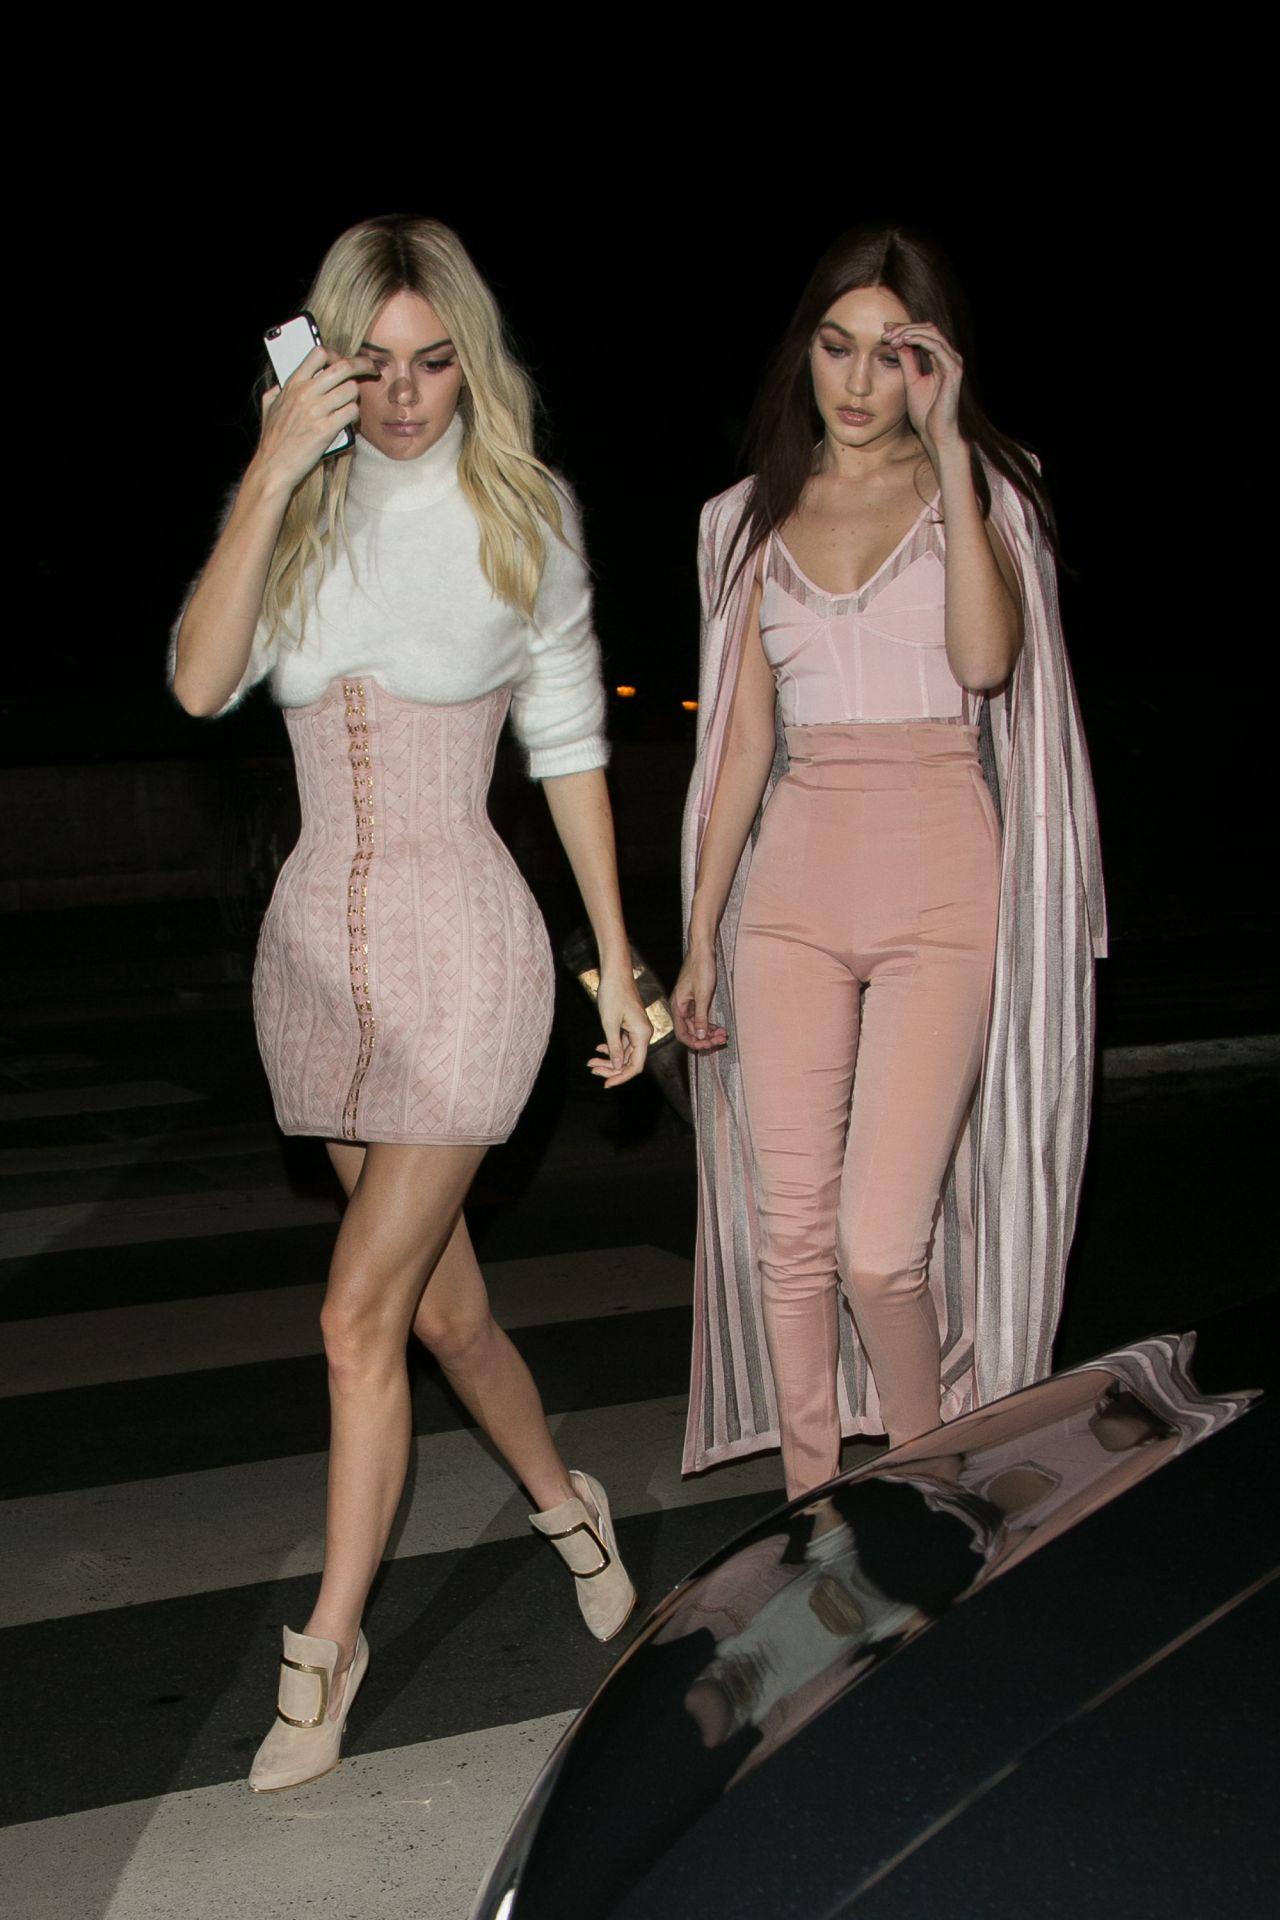 Kendall Jenner And Gigi Hadid Heading To The Balmain